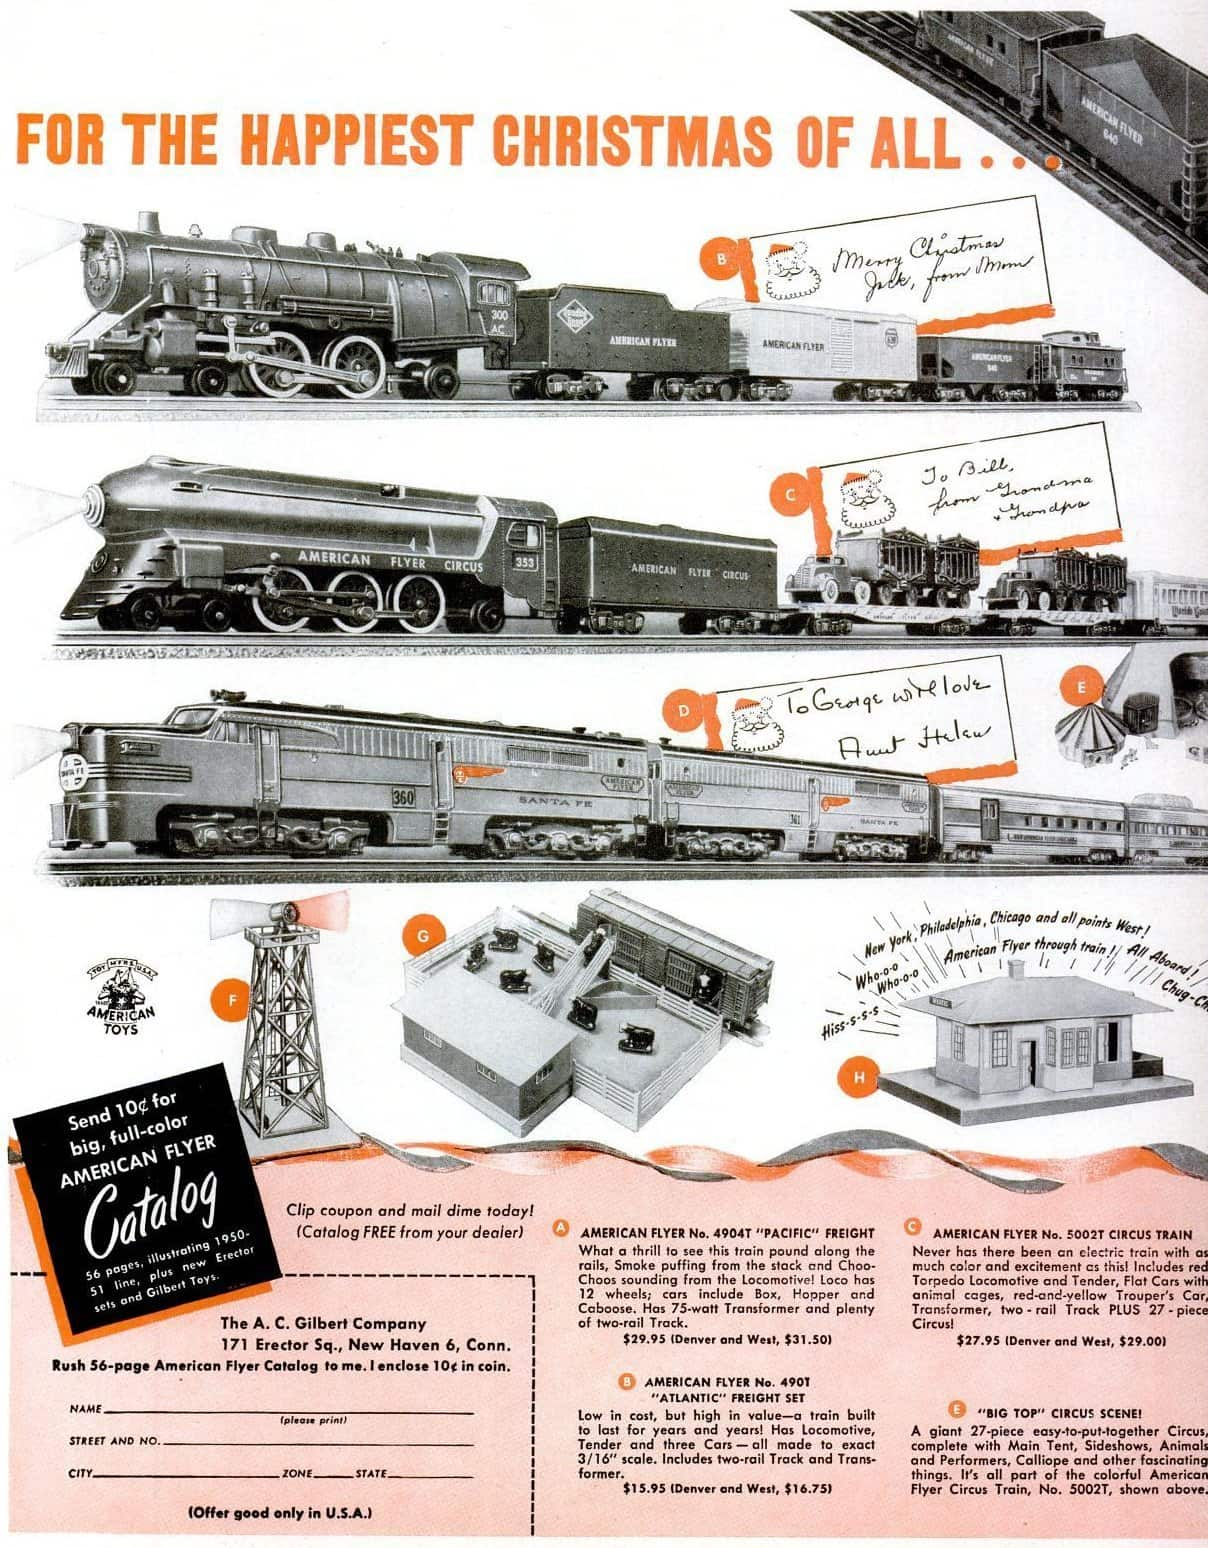 Vintage electric American Flyer train set toy (1950)